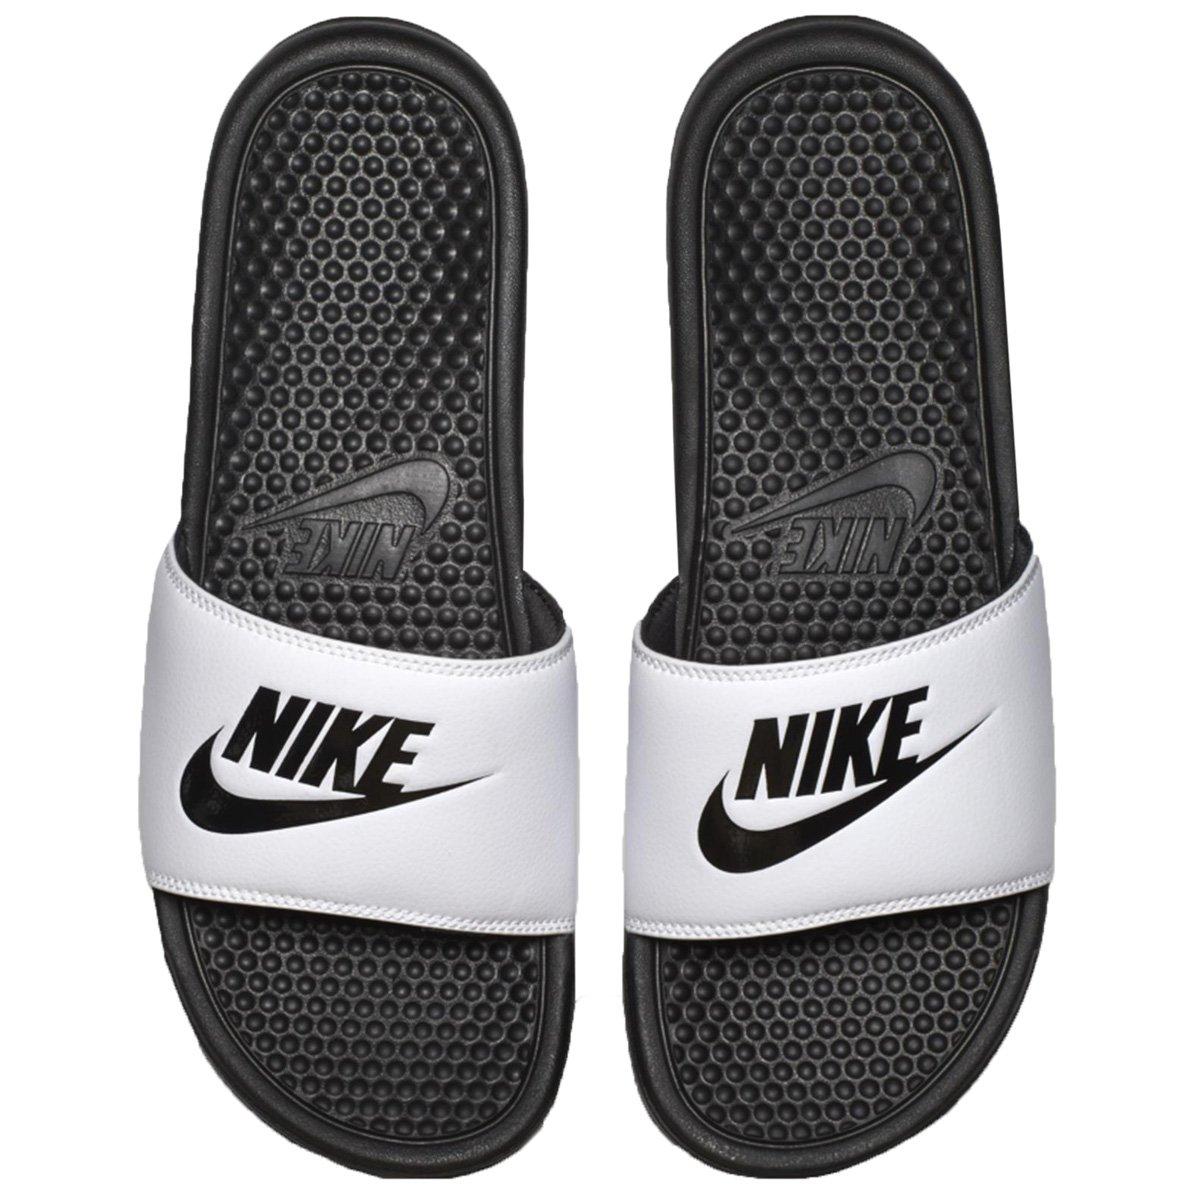 1e3118bf149 Chinelo Nike Benassi Just Do It 343880-100 - Branco Preto - Botas ...